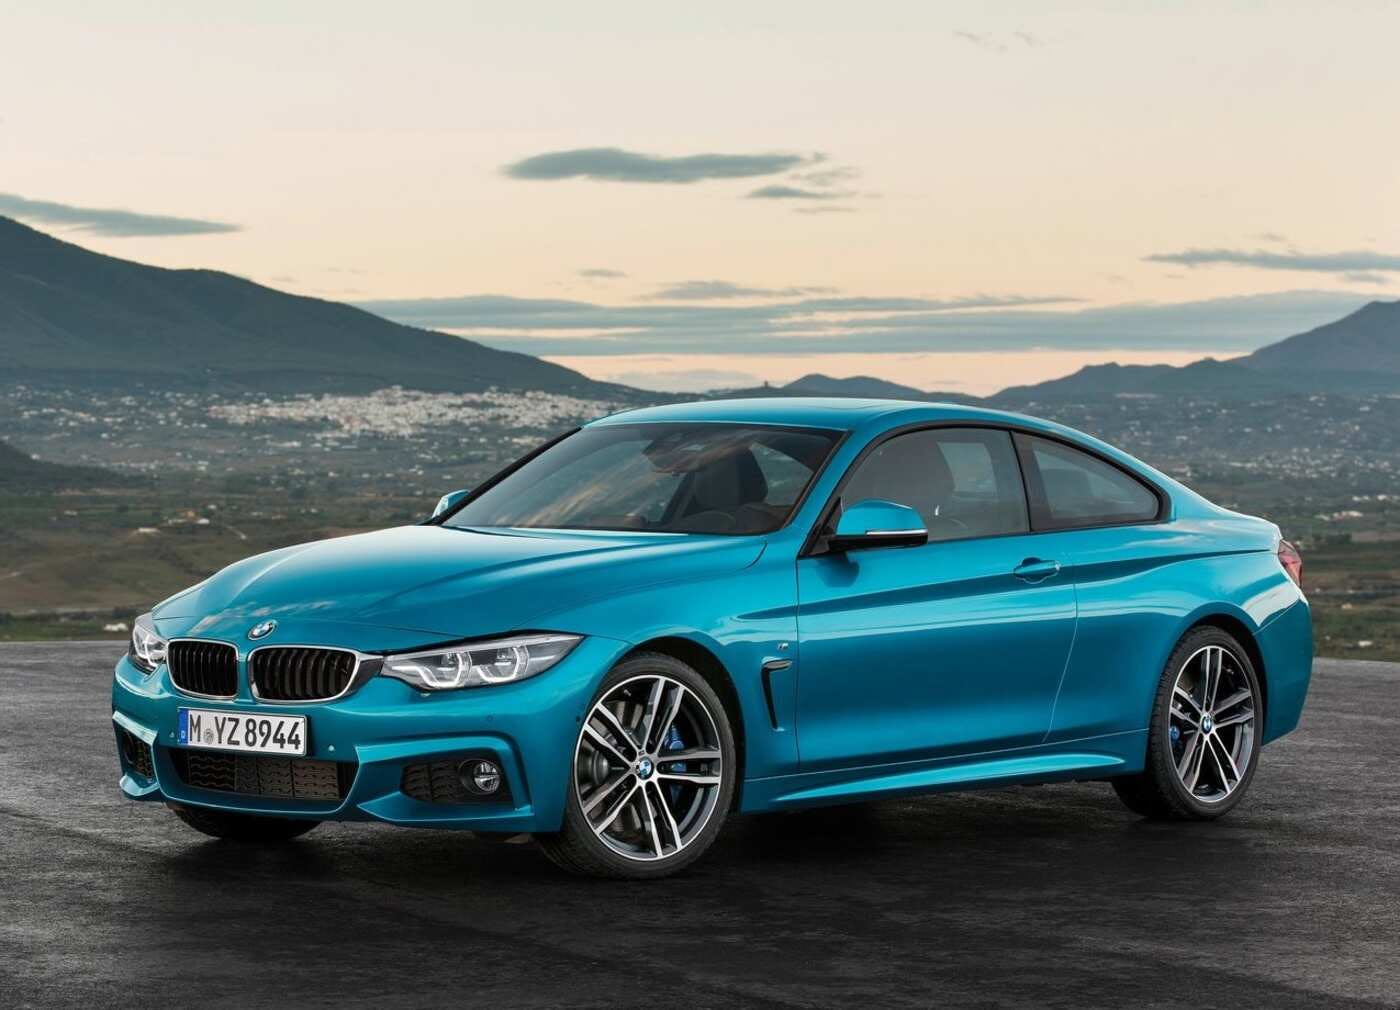 2019 BMW 4 Series Comparisons, Reviews & Pictures | TrueCar